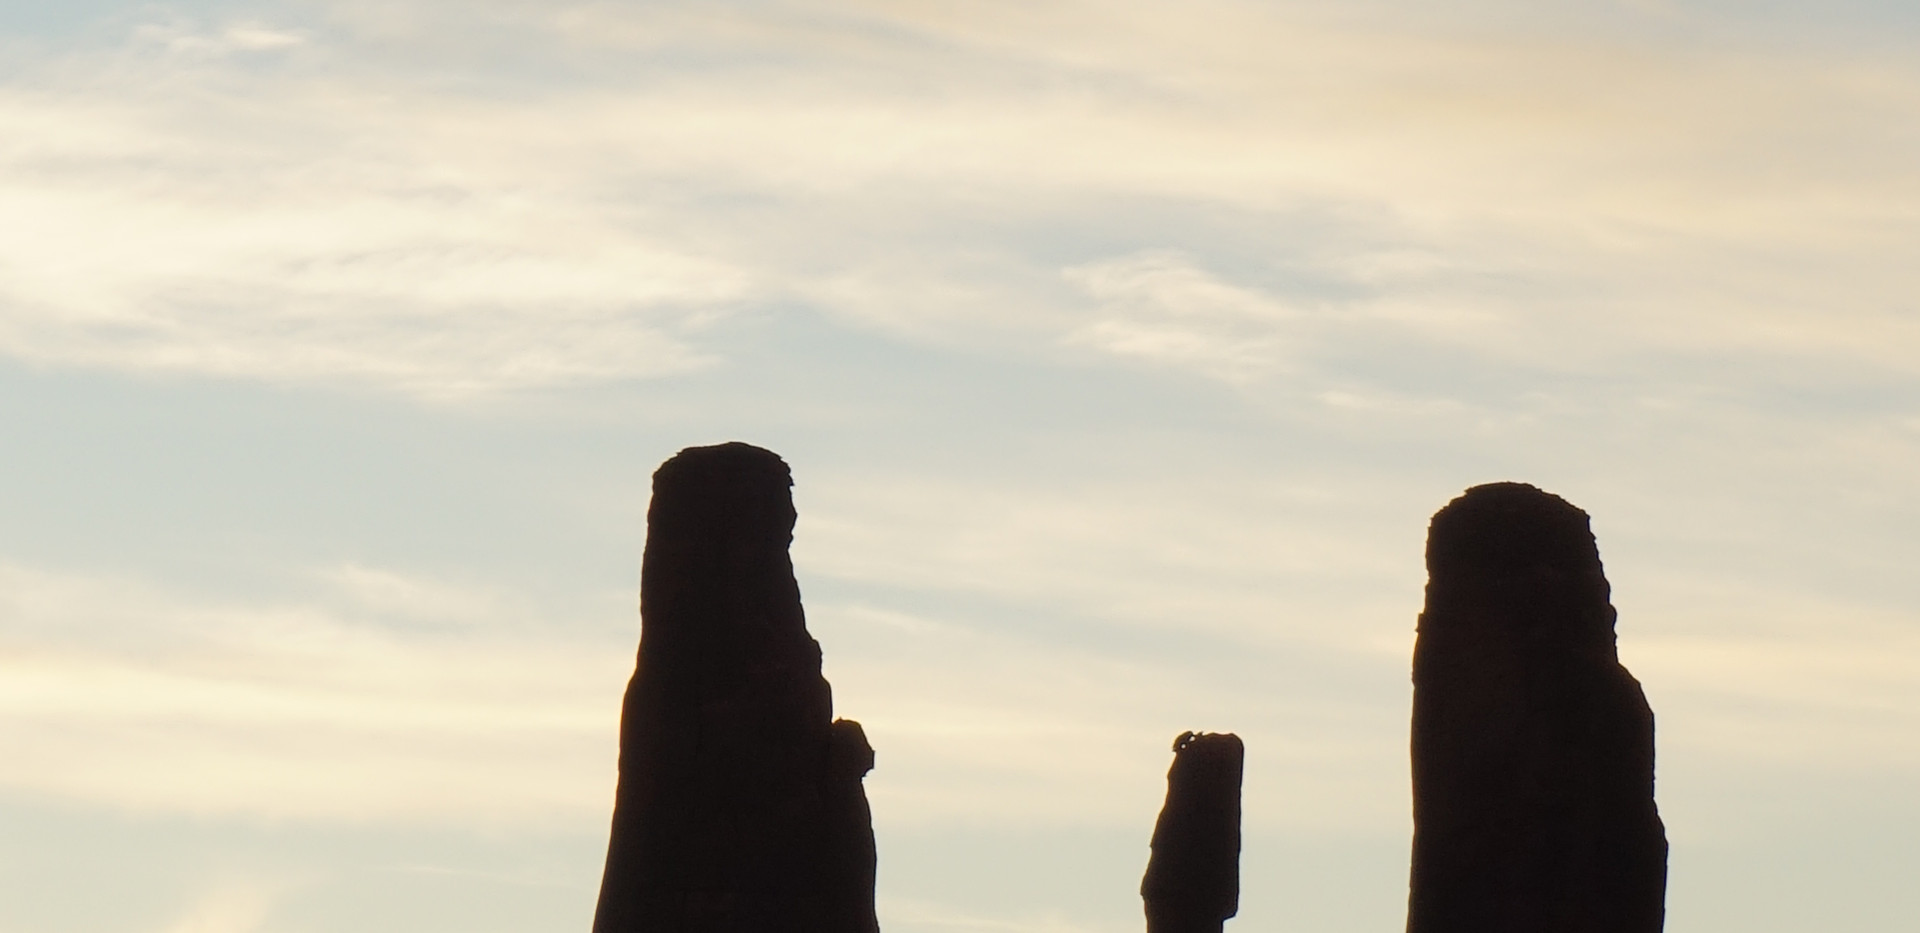 3 sisters (monument Valley).JPG